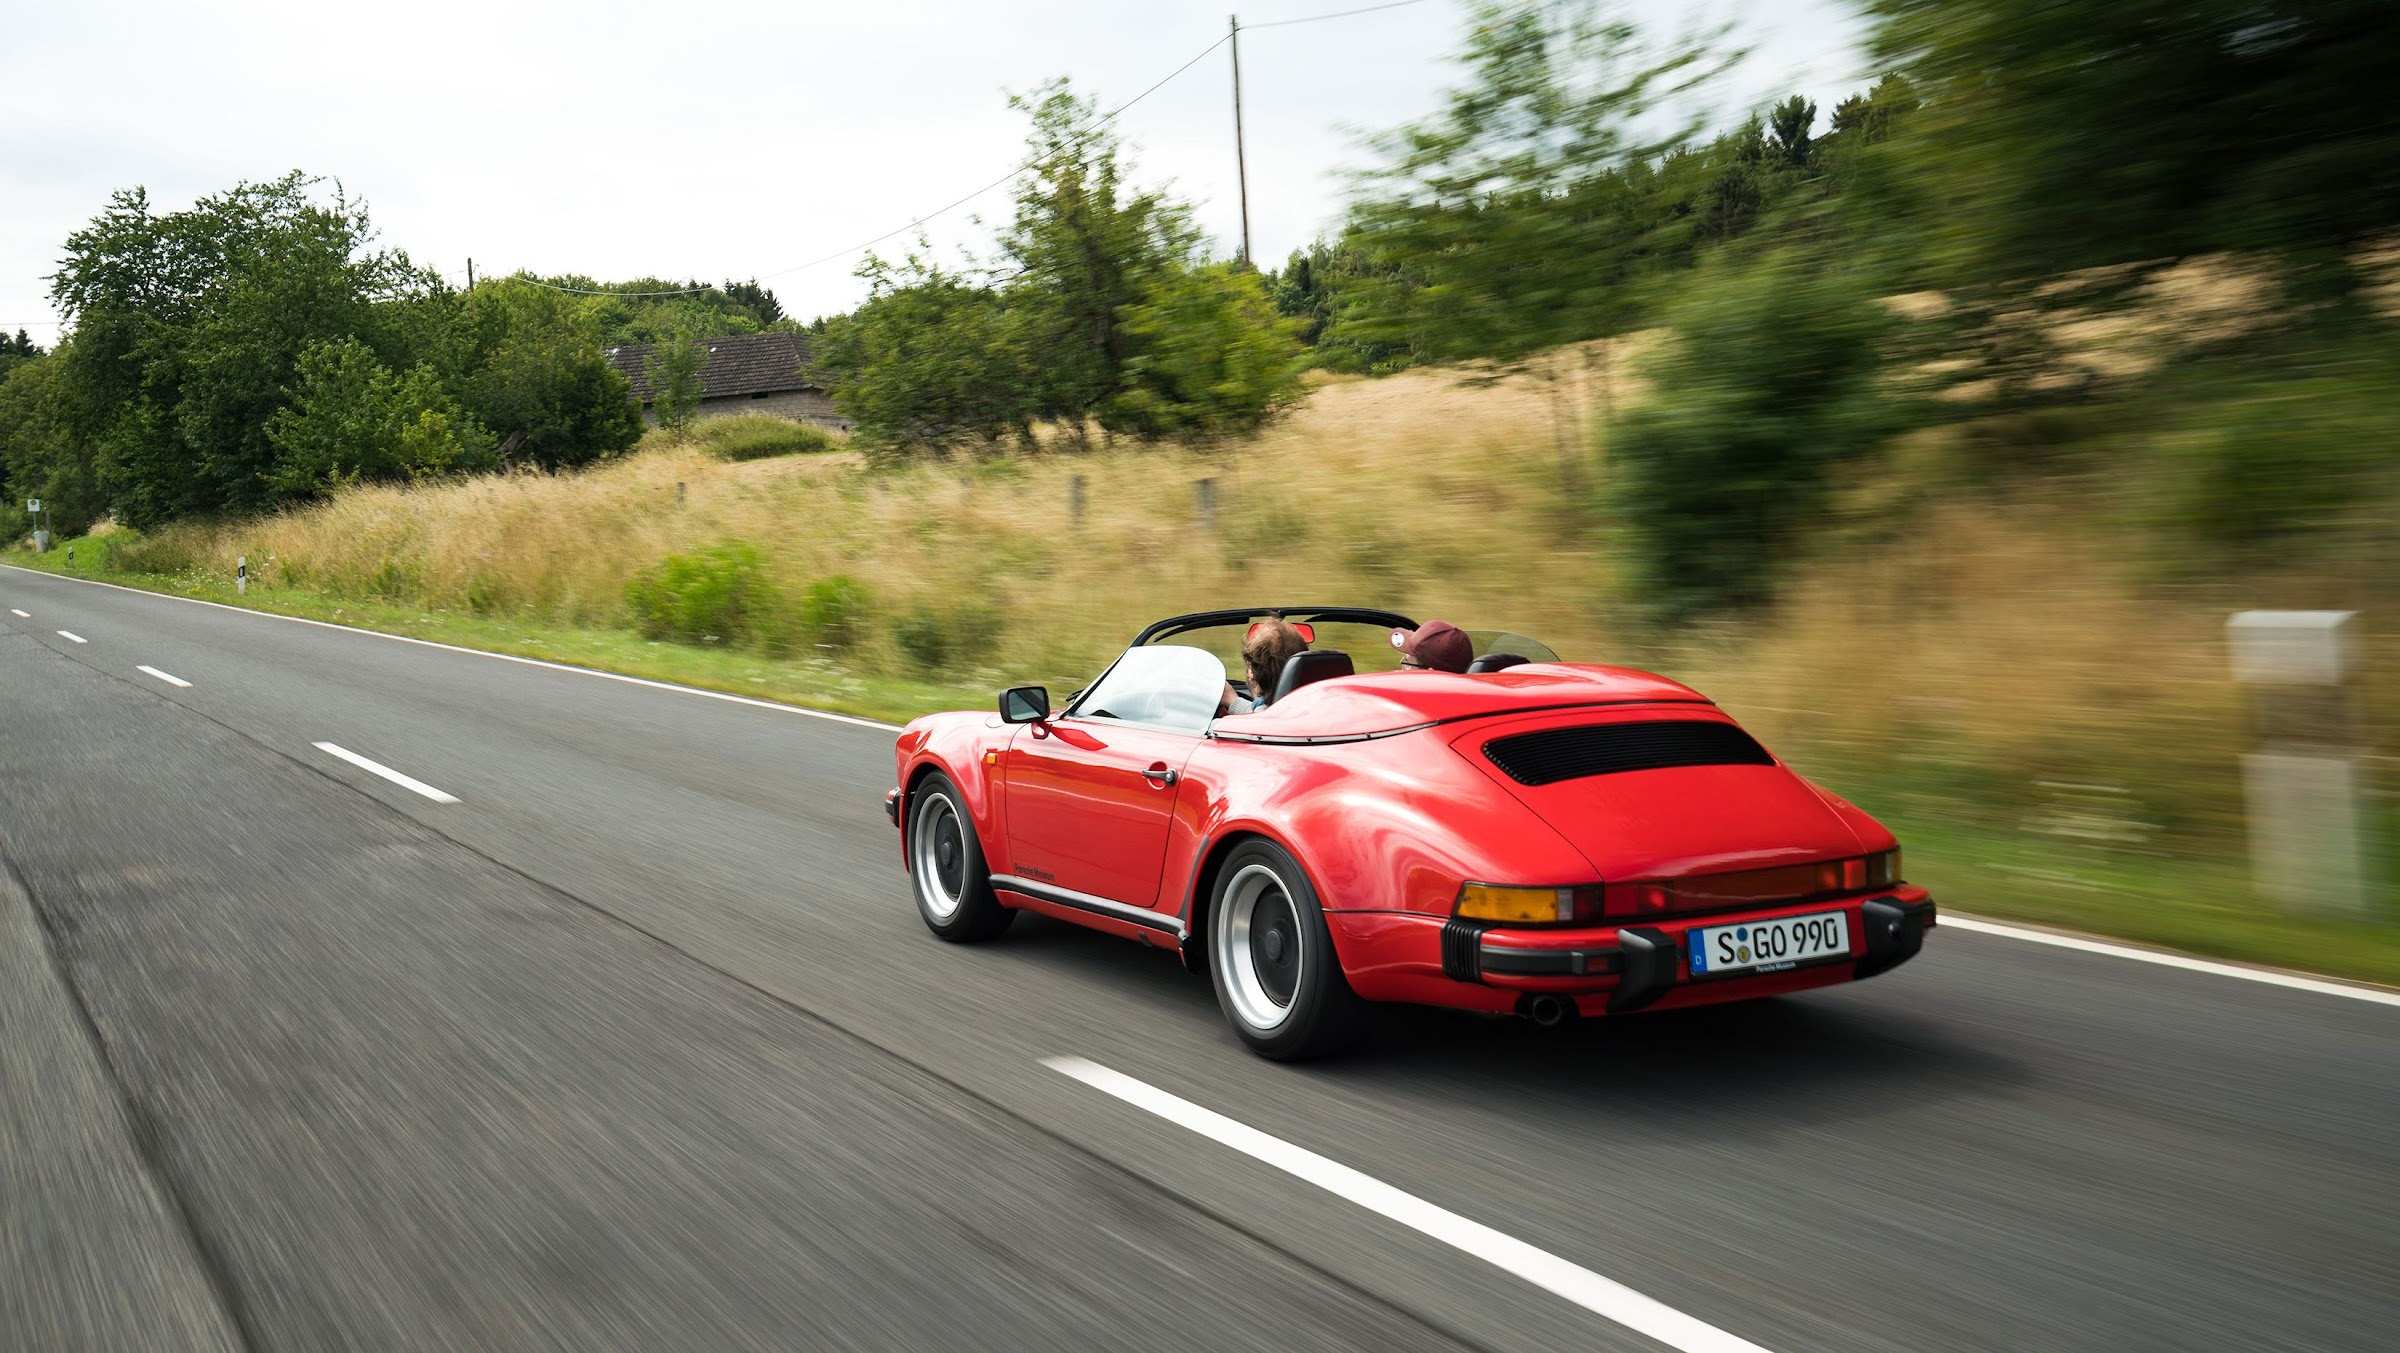 9J5NUBfvb0l7O78pvqJoUqYABGju6fry3kcjcWDMuz9XJ8 A5m9txbzQDZQWbr WD PsAkdHuvXb8 ufaFtSPpLuRCA 6cTT Uofavmq eL cw3gYn7ptjoZSeow1TbfUOpCOBtiYA=w2400 - Porsche Speedster, una historia al aire libre